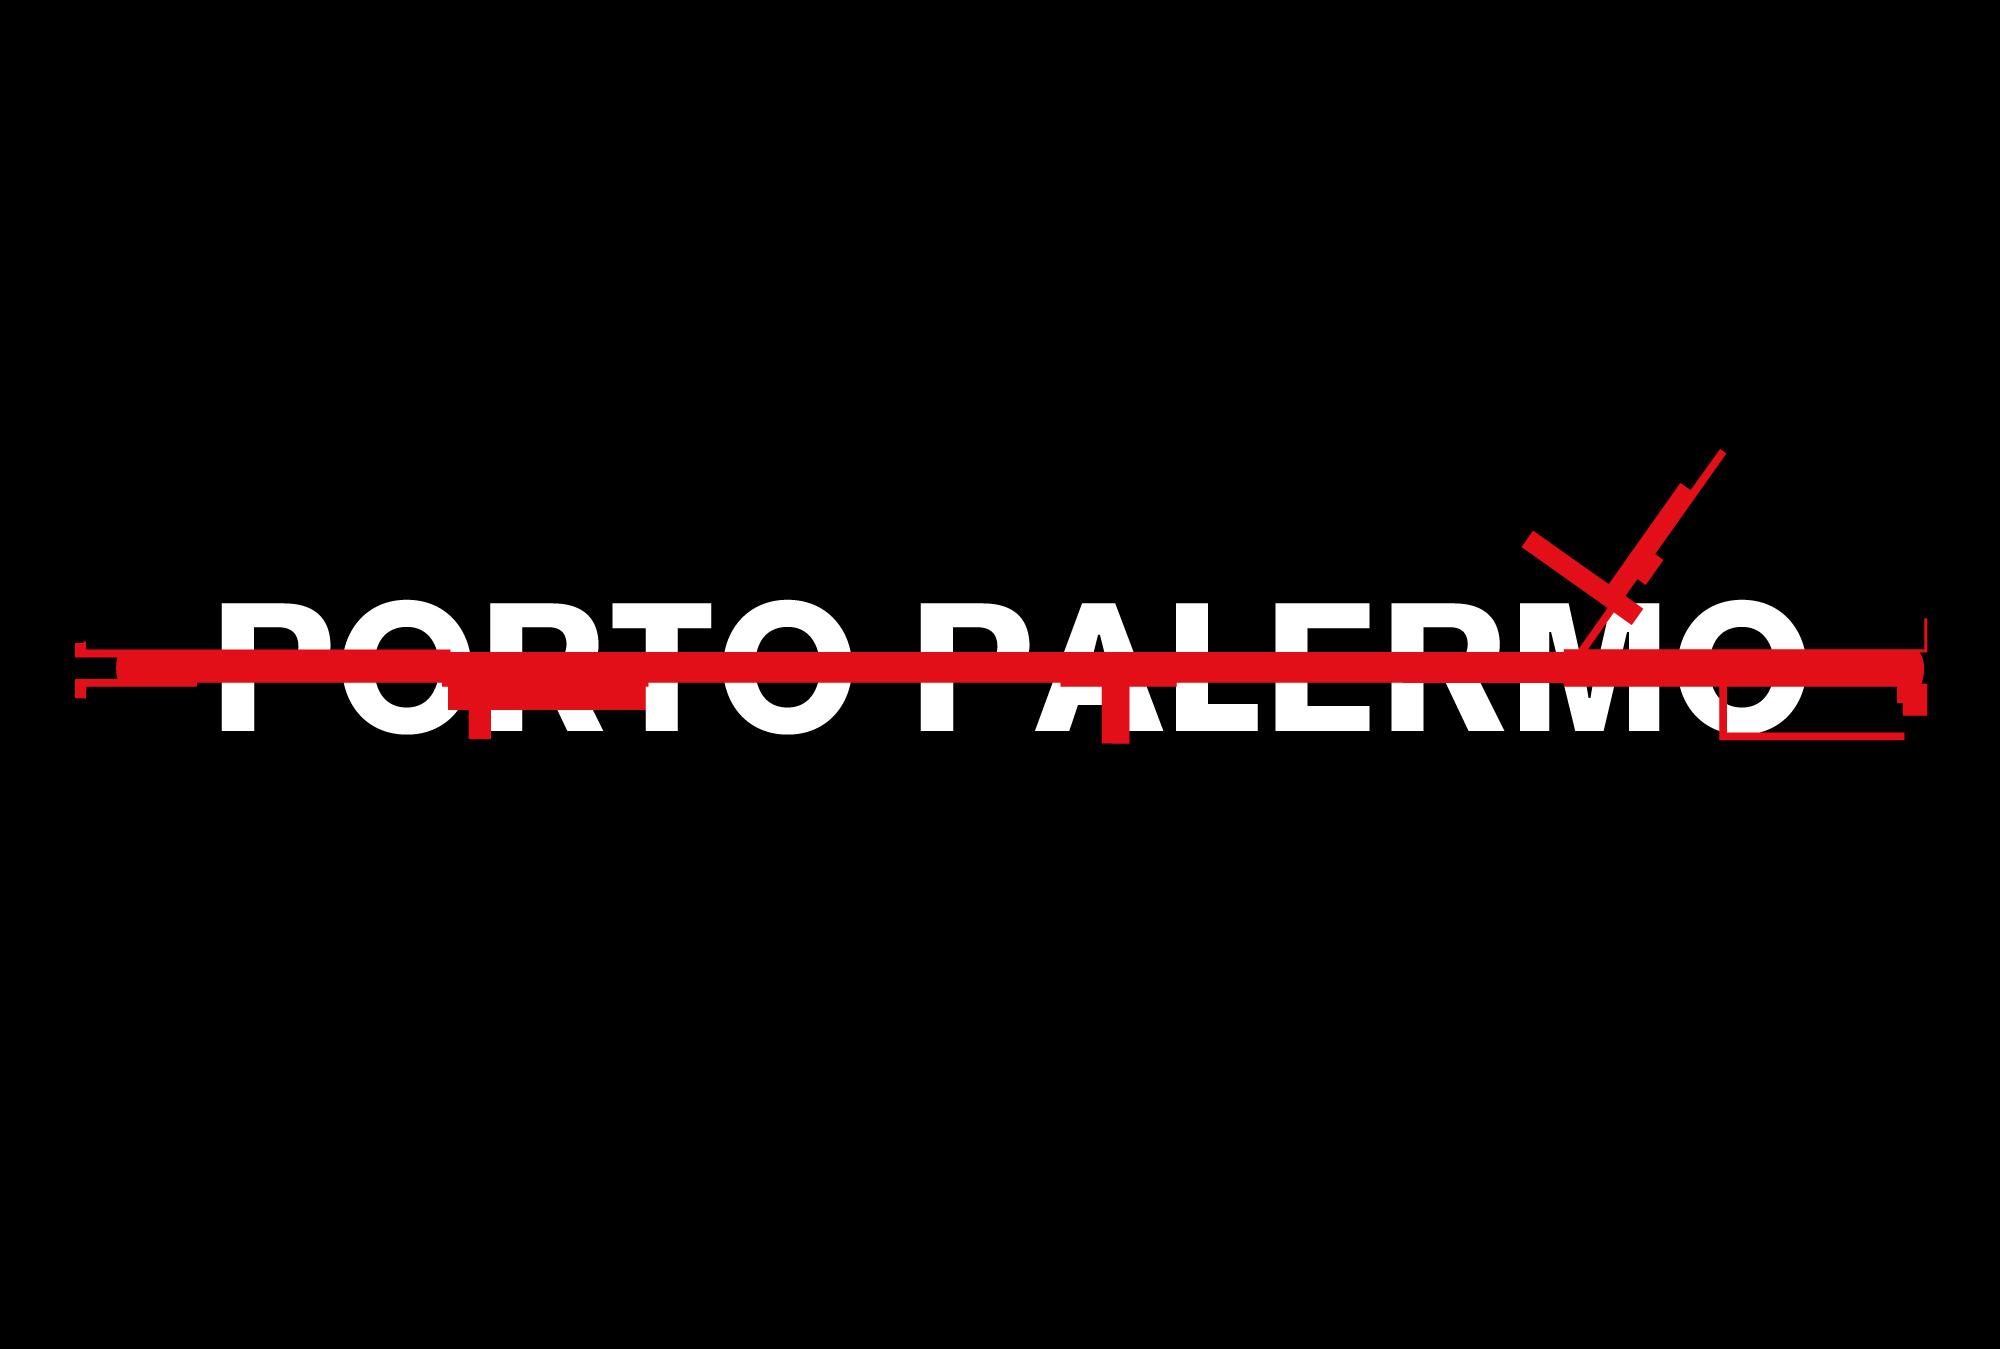 2011_Porto-Palermo_Logo